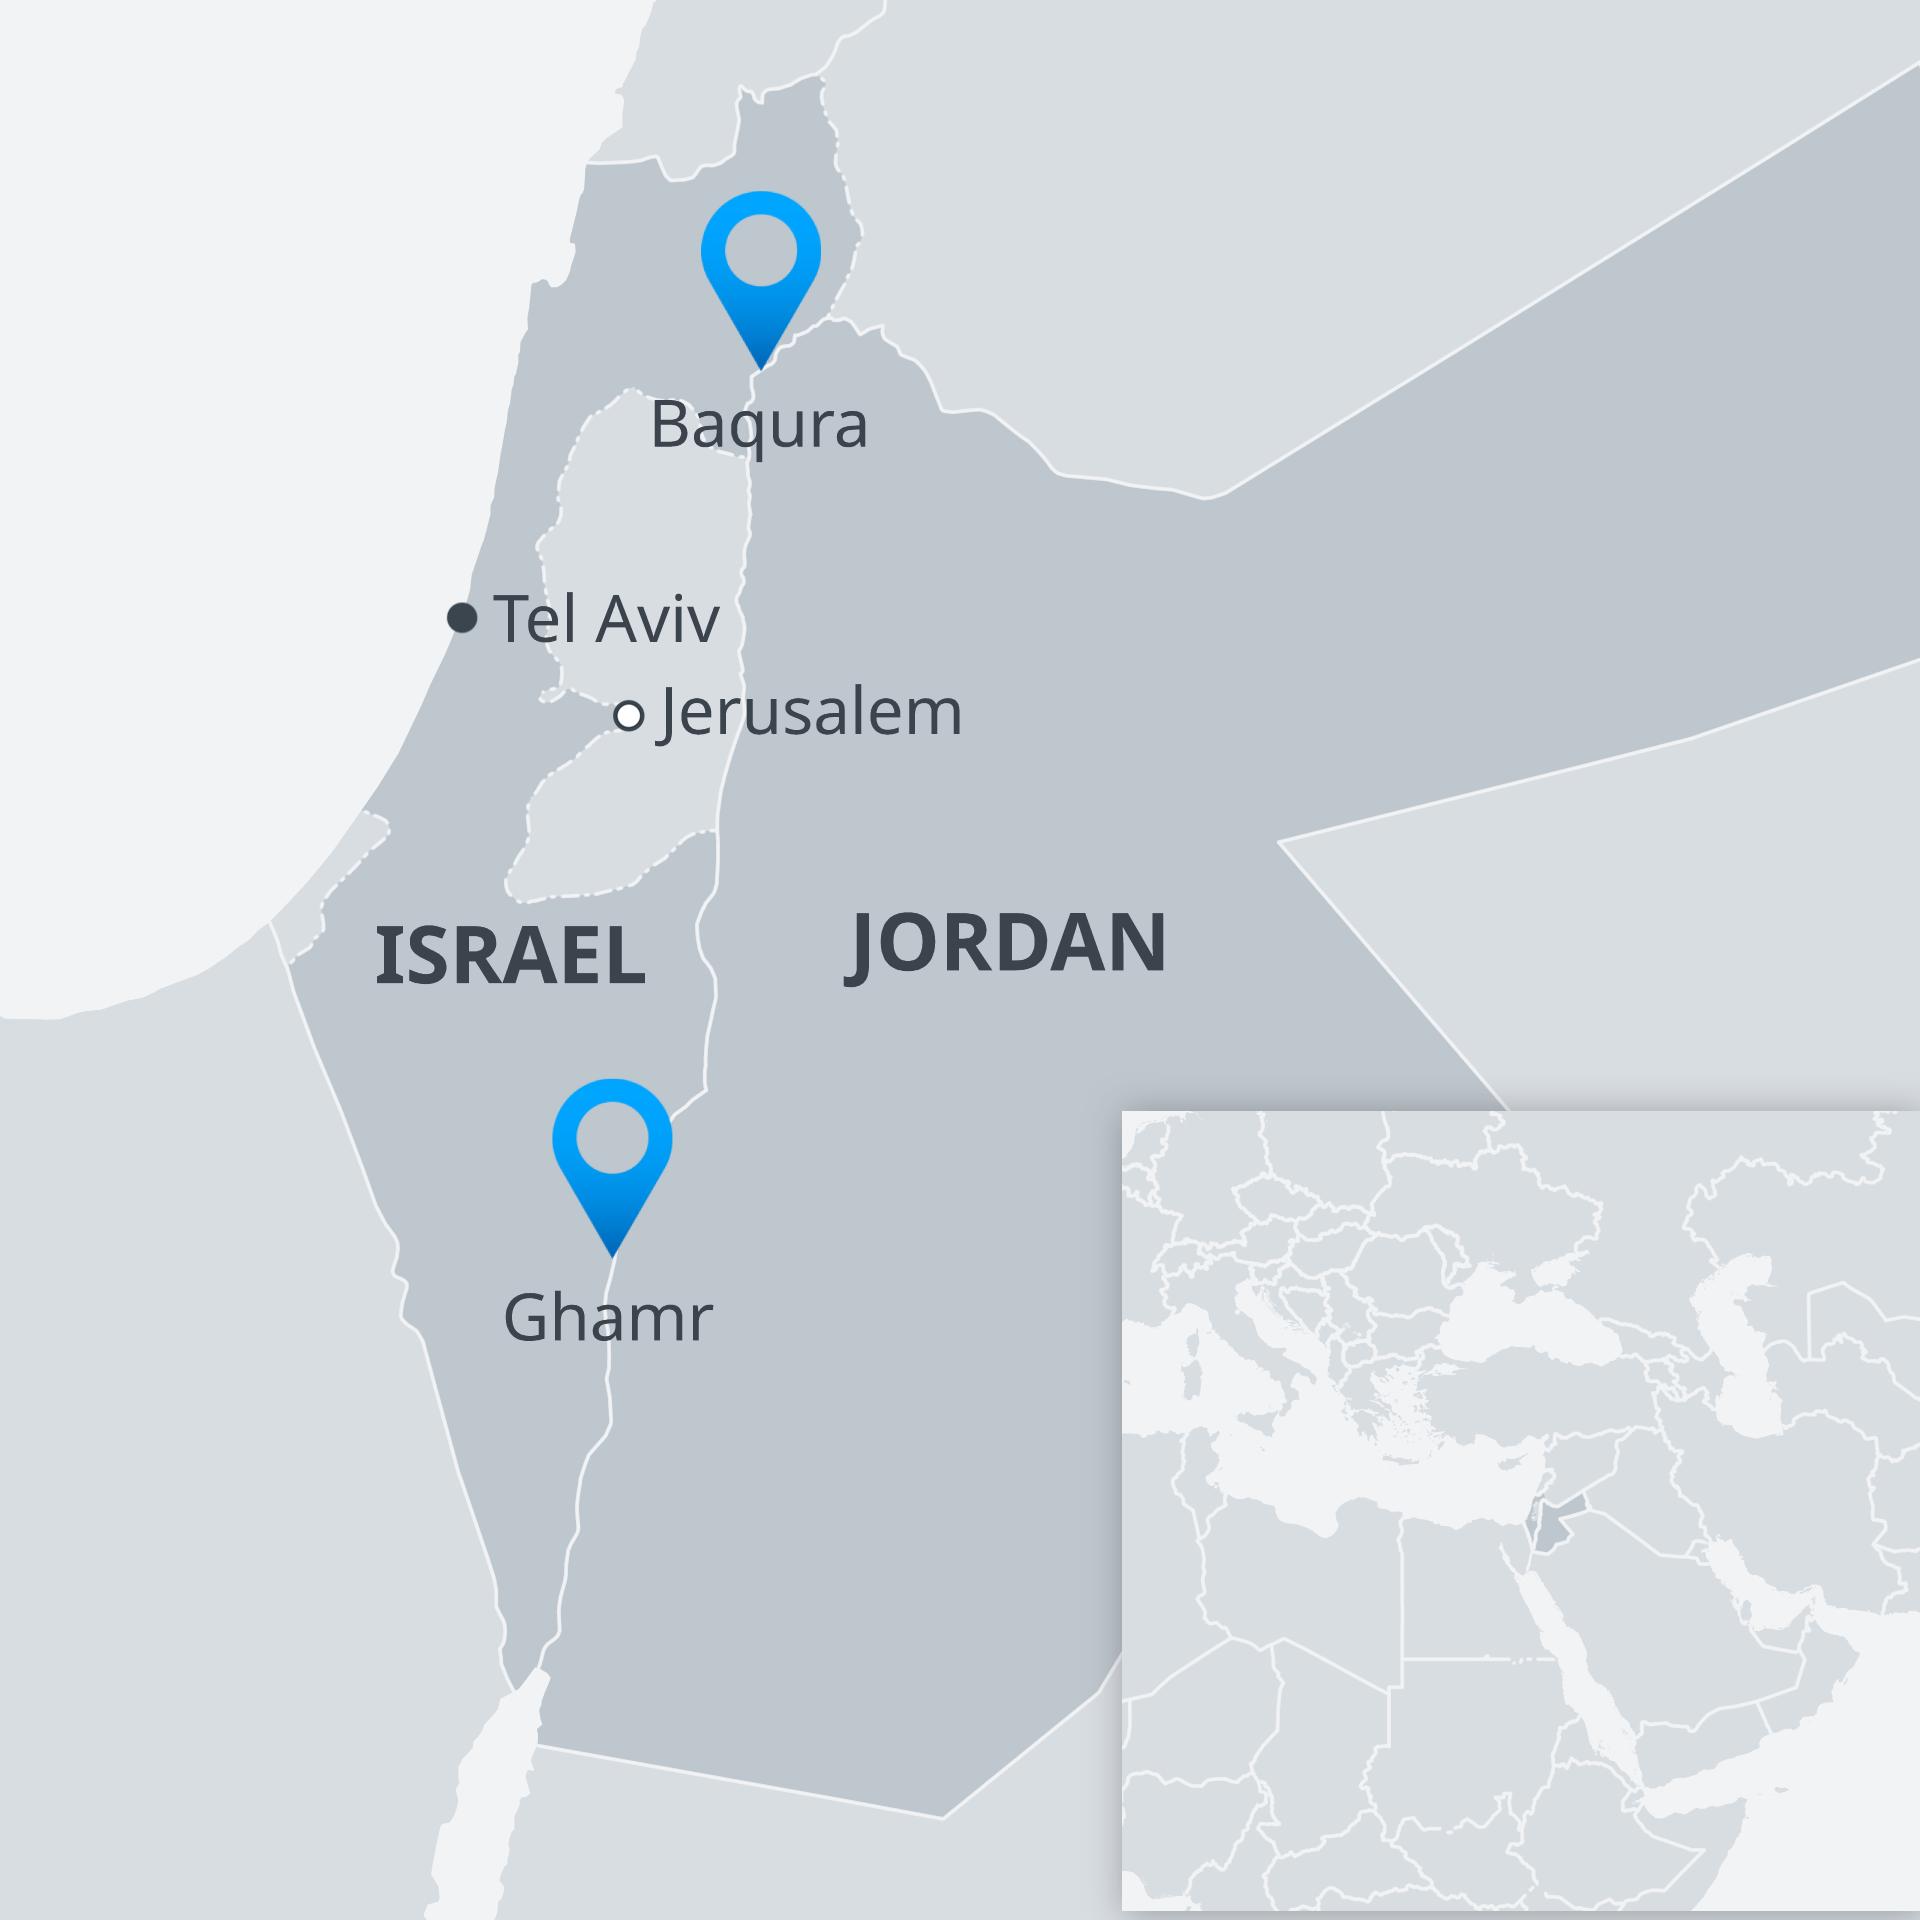 Israel Jerusalem Karte.Jordan S King To Scrap Part Of Israel Peace Treaty News